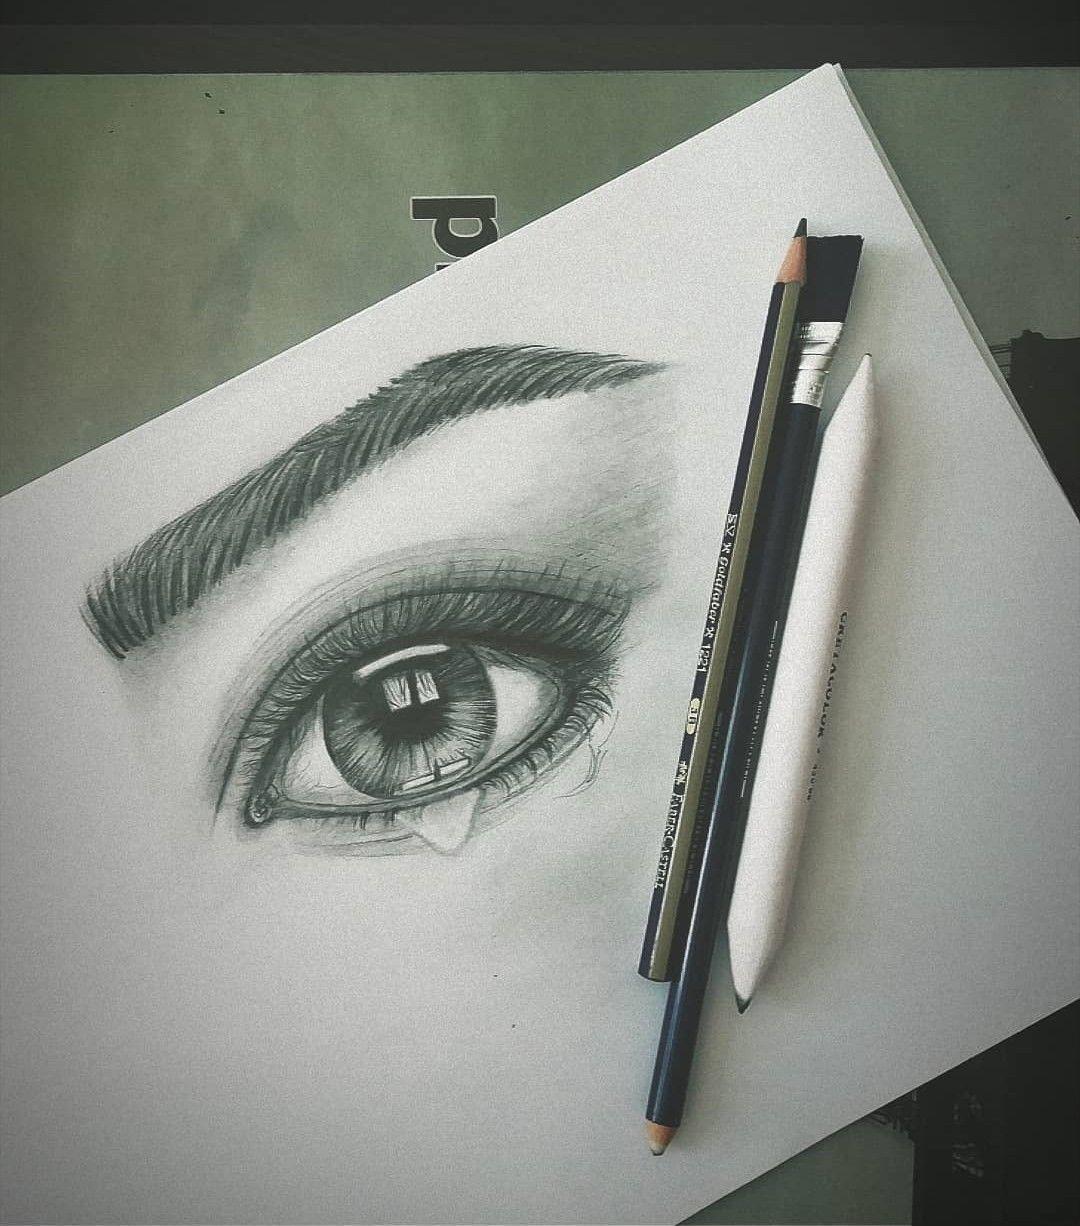 Eye design in 2020 | Eye design, Diseases of the eye ...